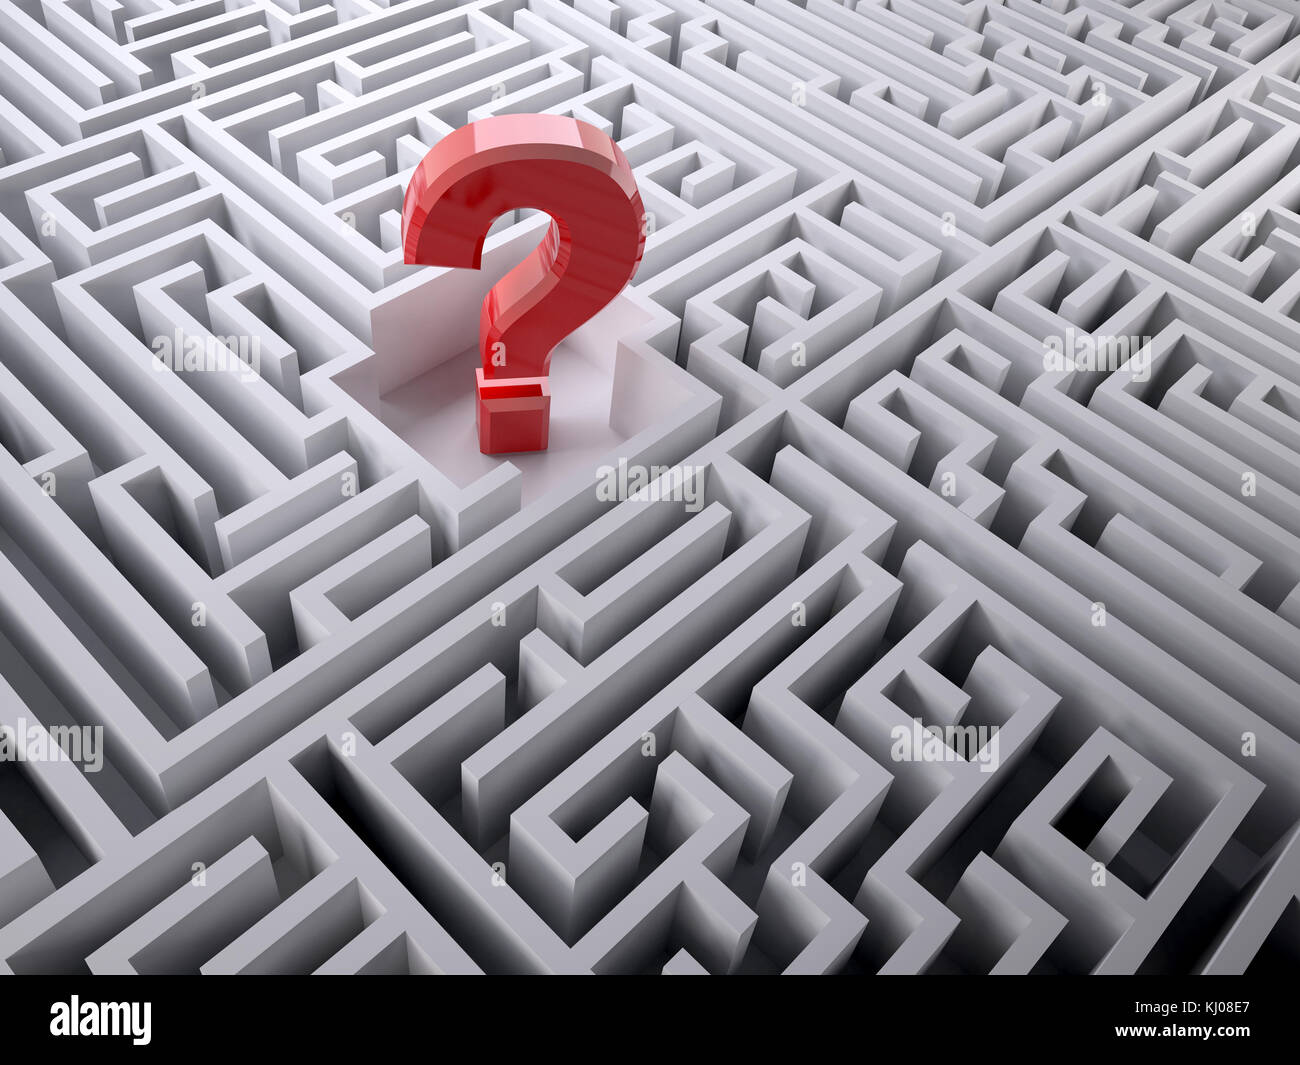 Rote Fragezeichen im Labyrinth Labyrinth, 3 Abbildung d Stockbild